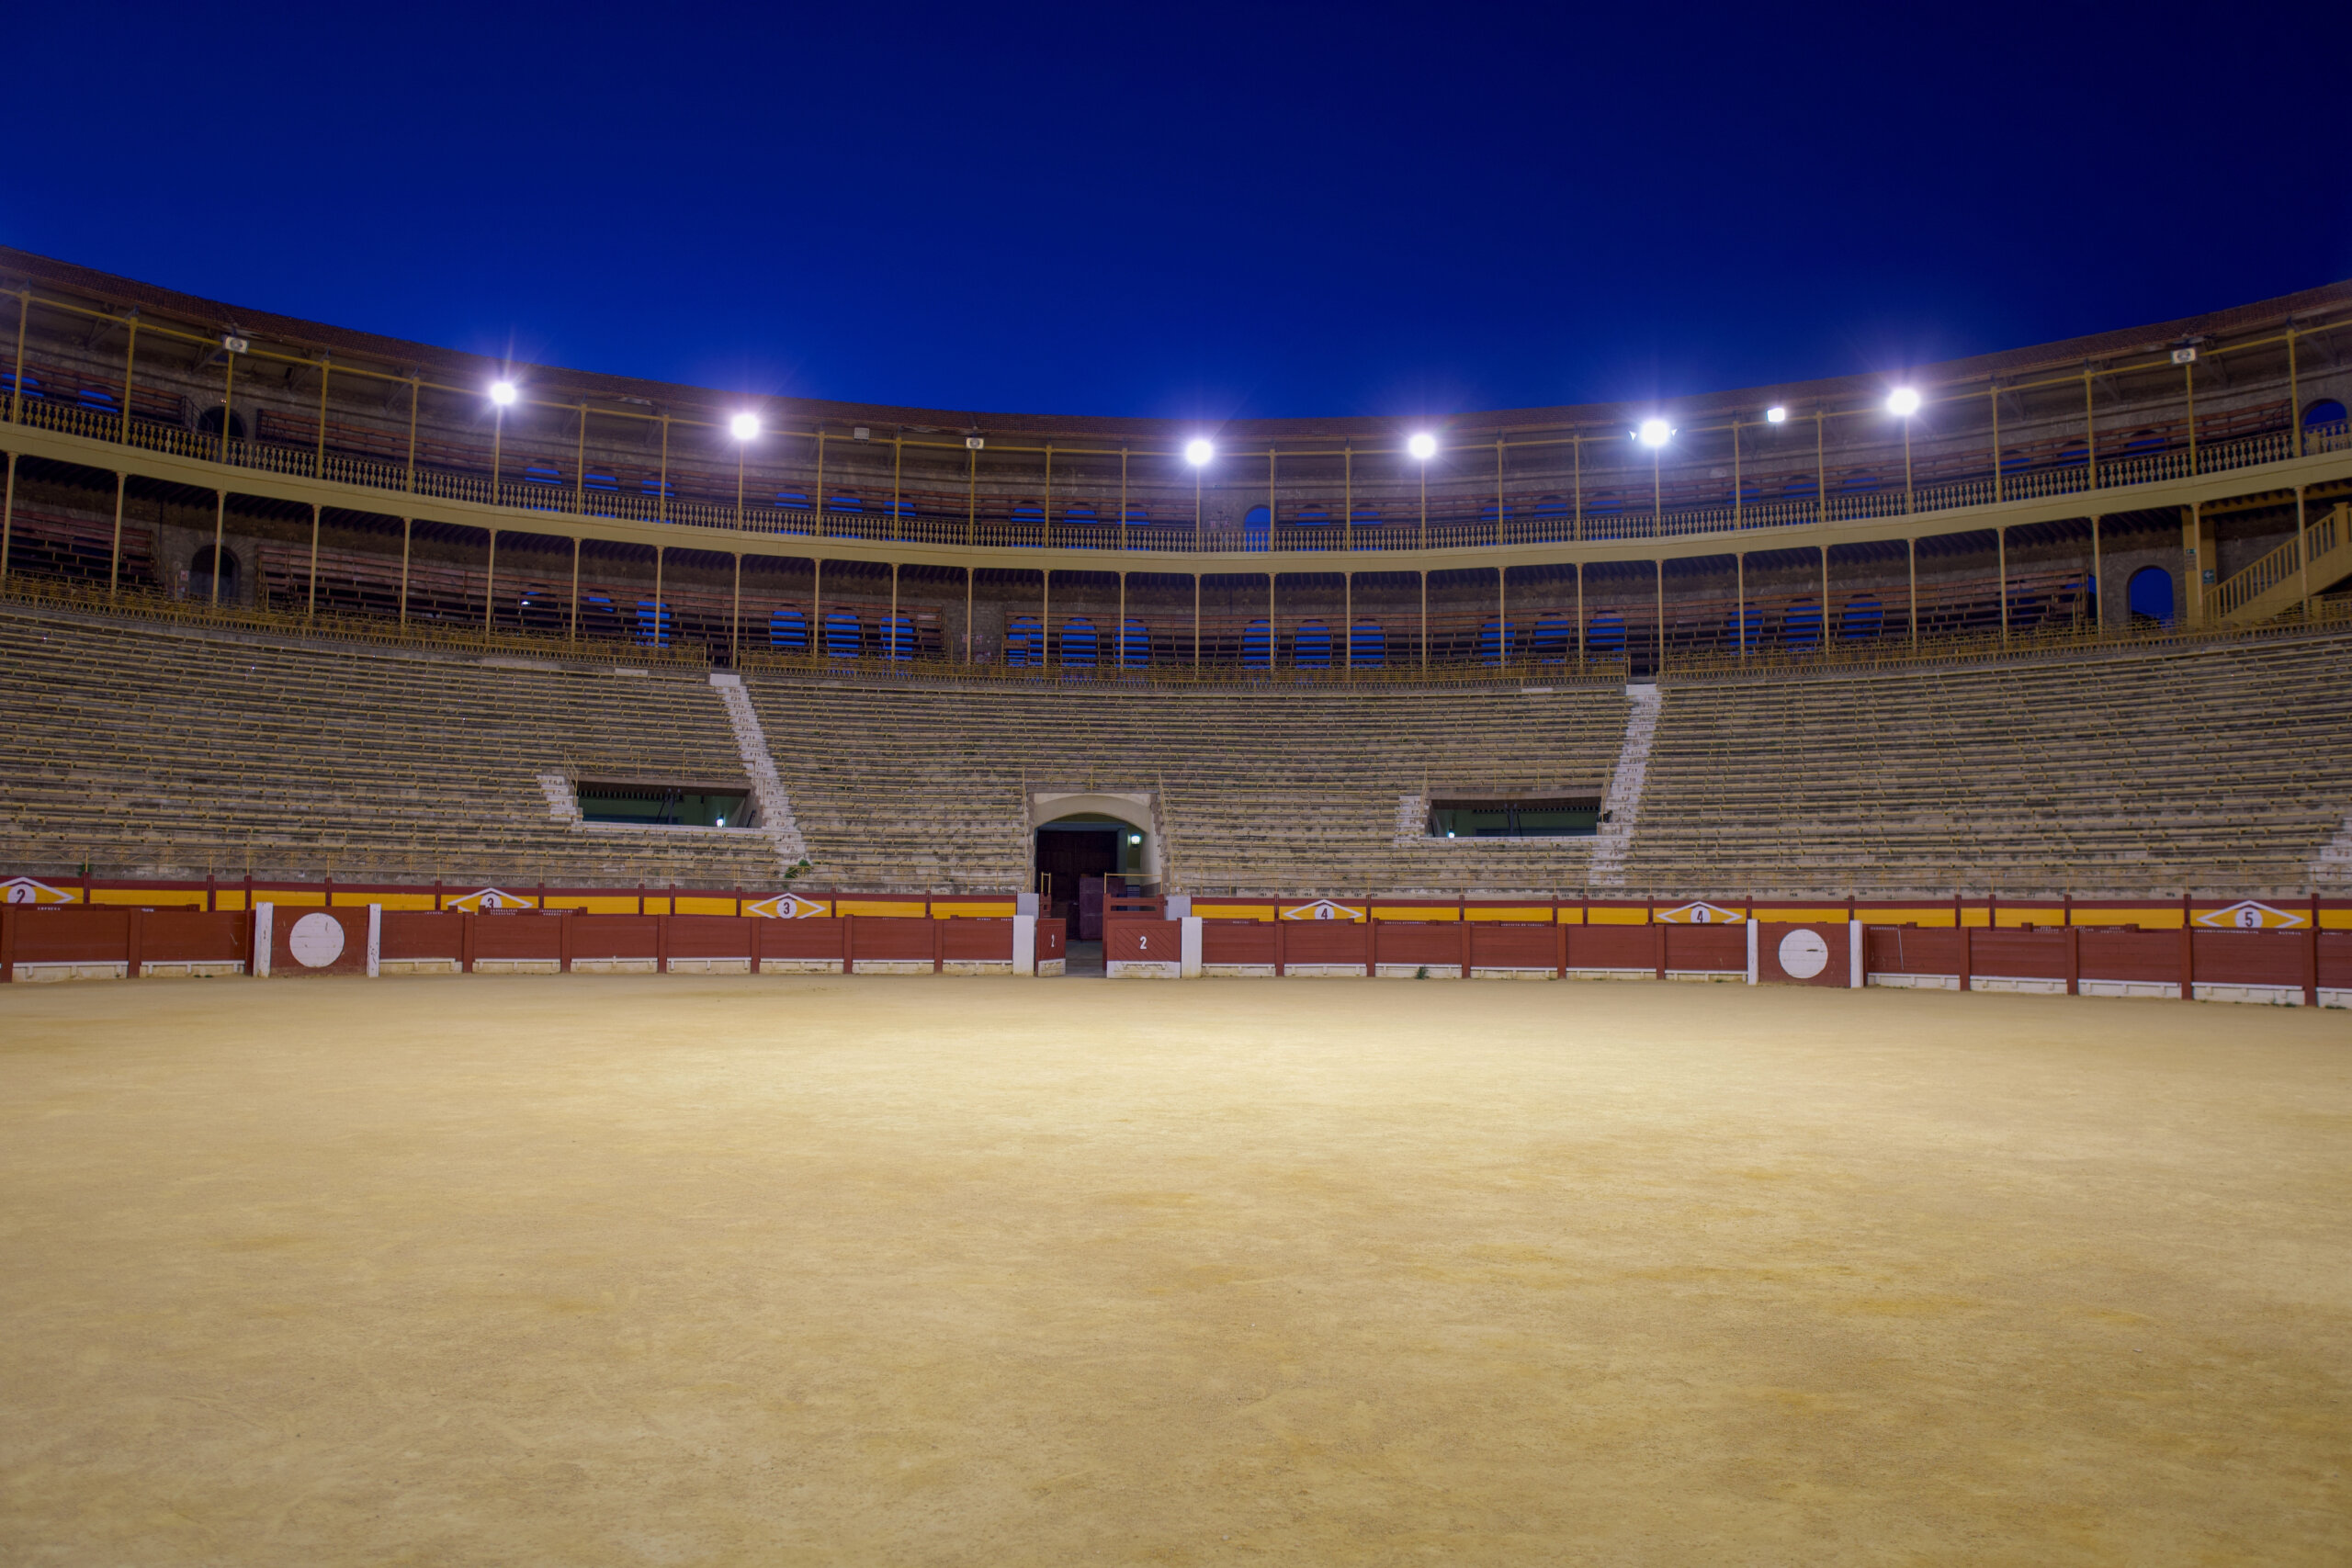 Plaza de Toros de Alicante 182 scaled